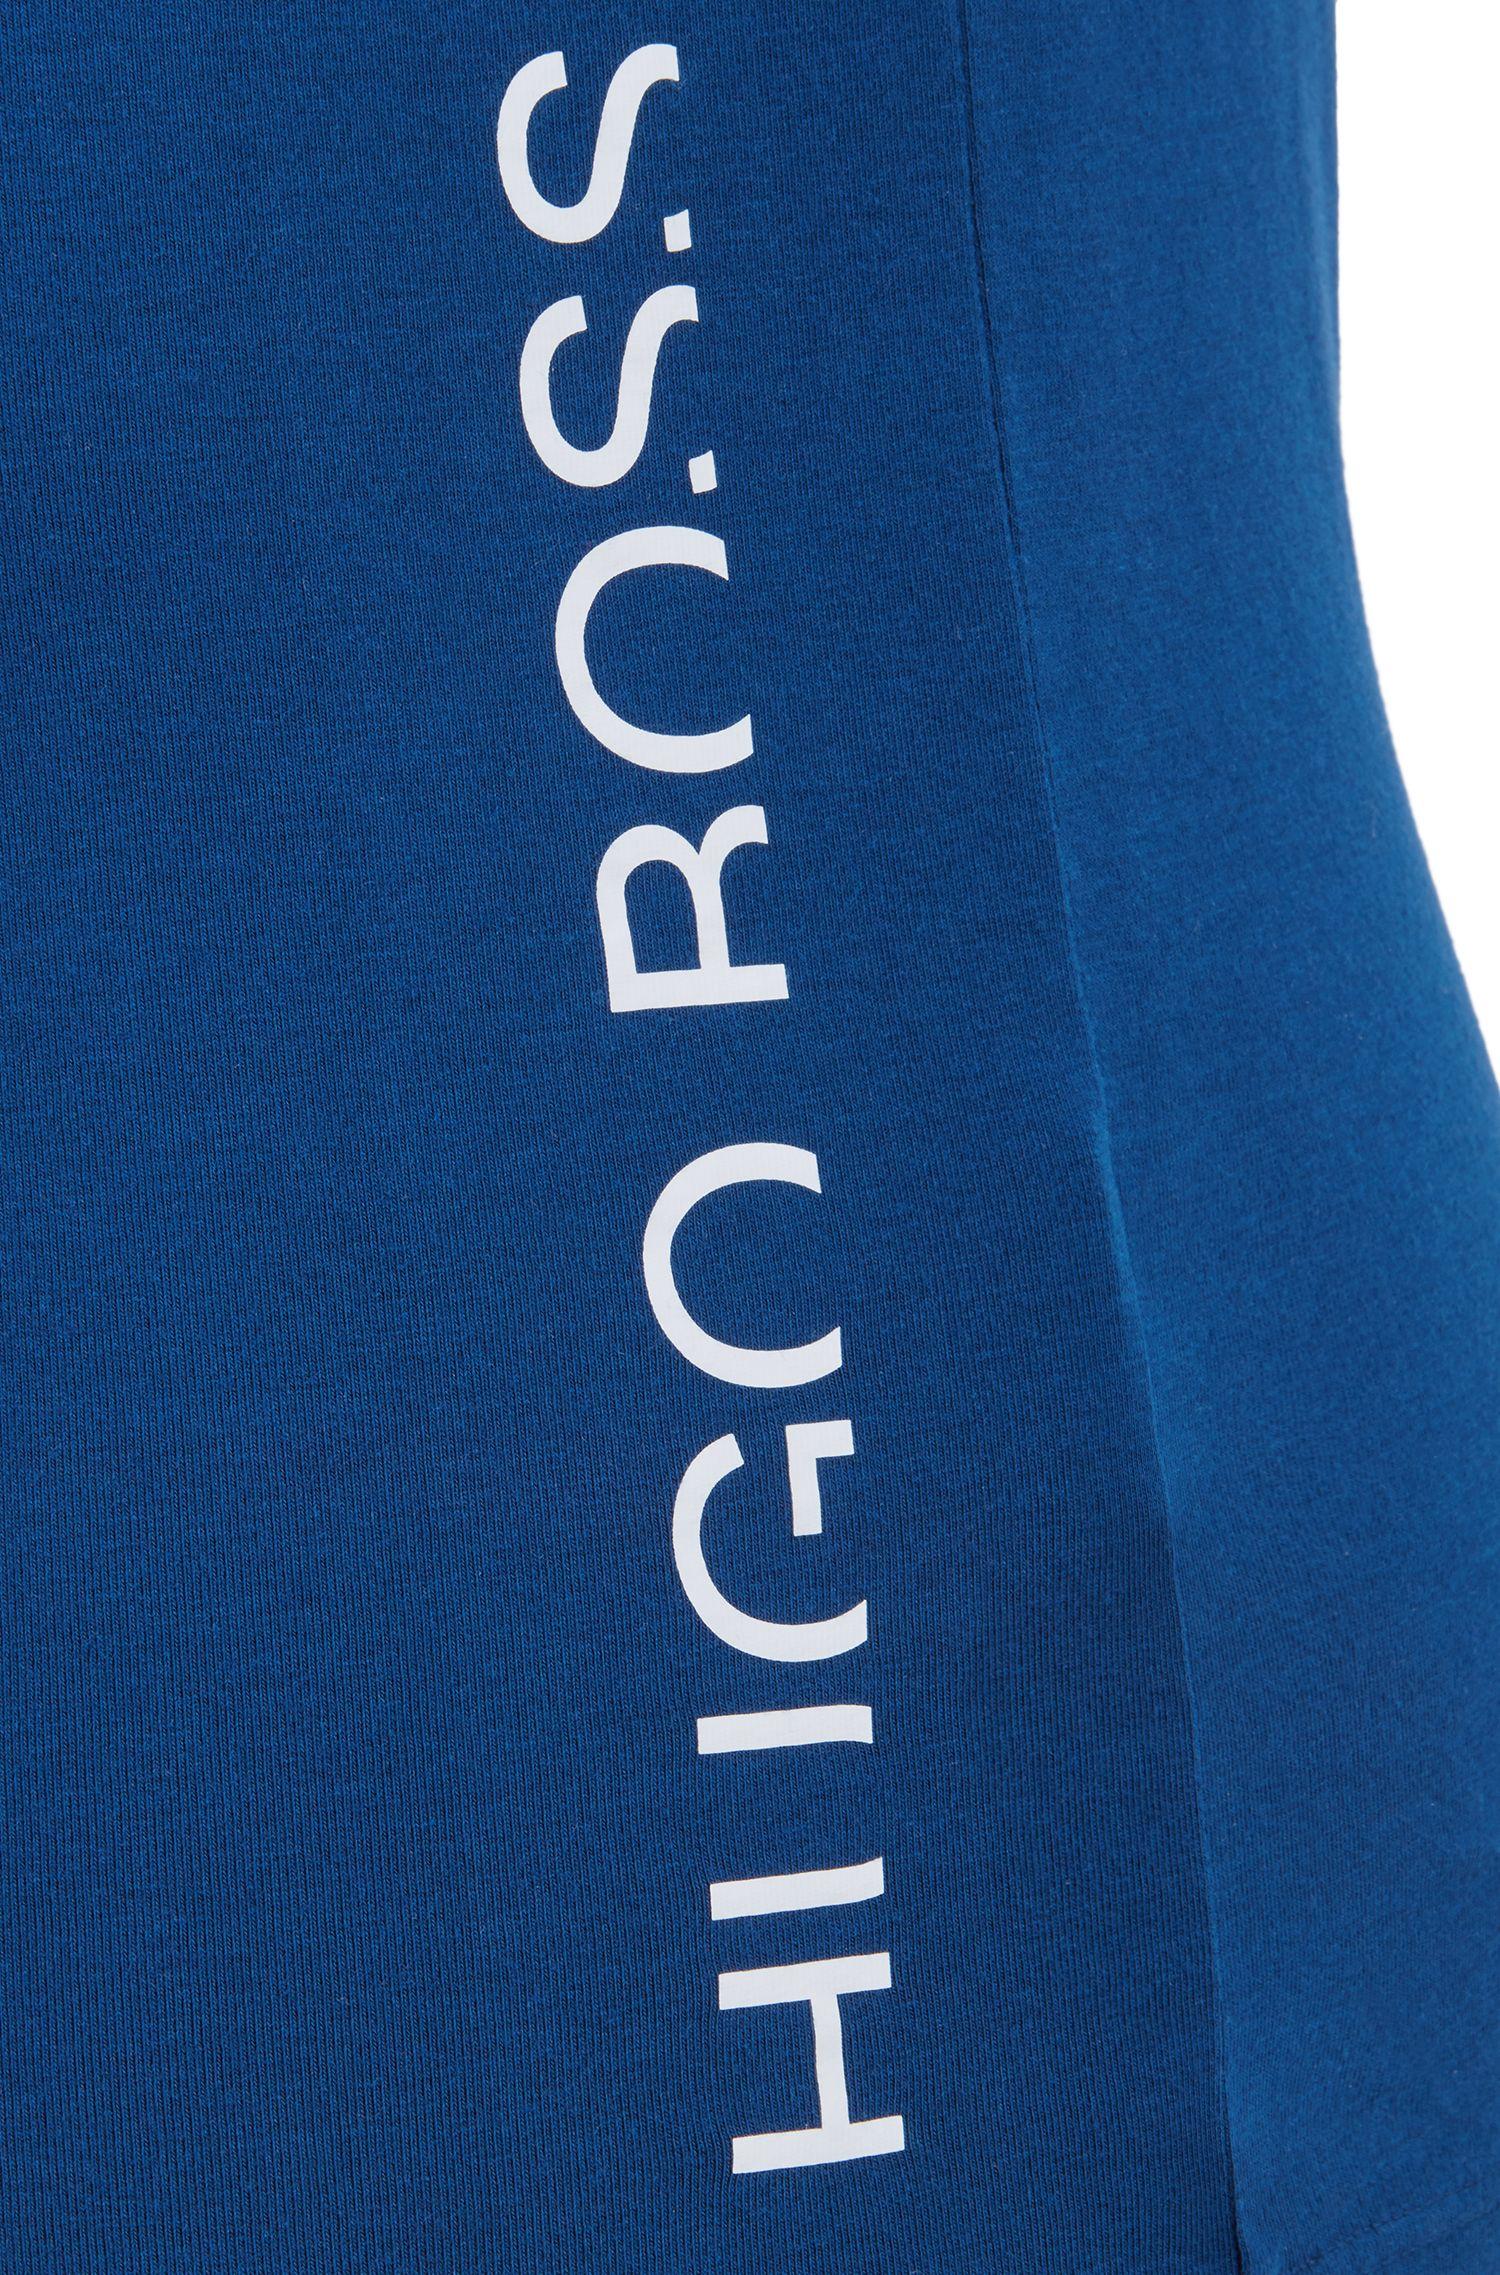 Tanktop mit abgeschnittenem Logo, Blau